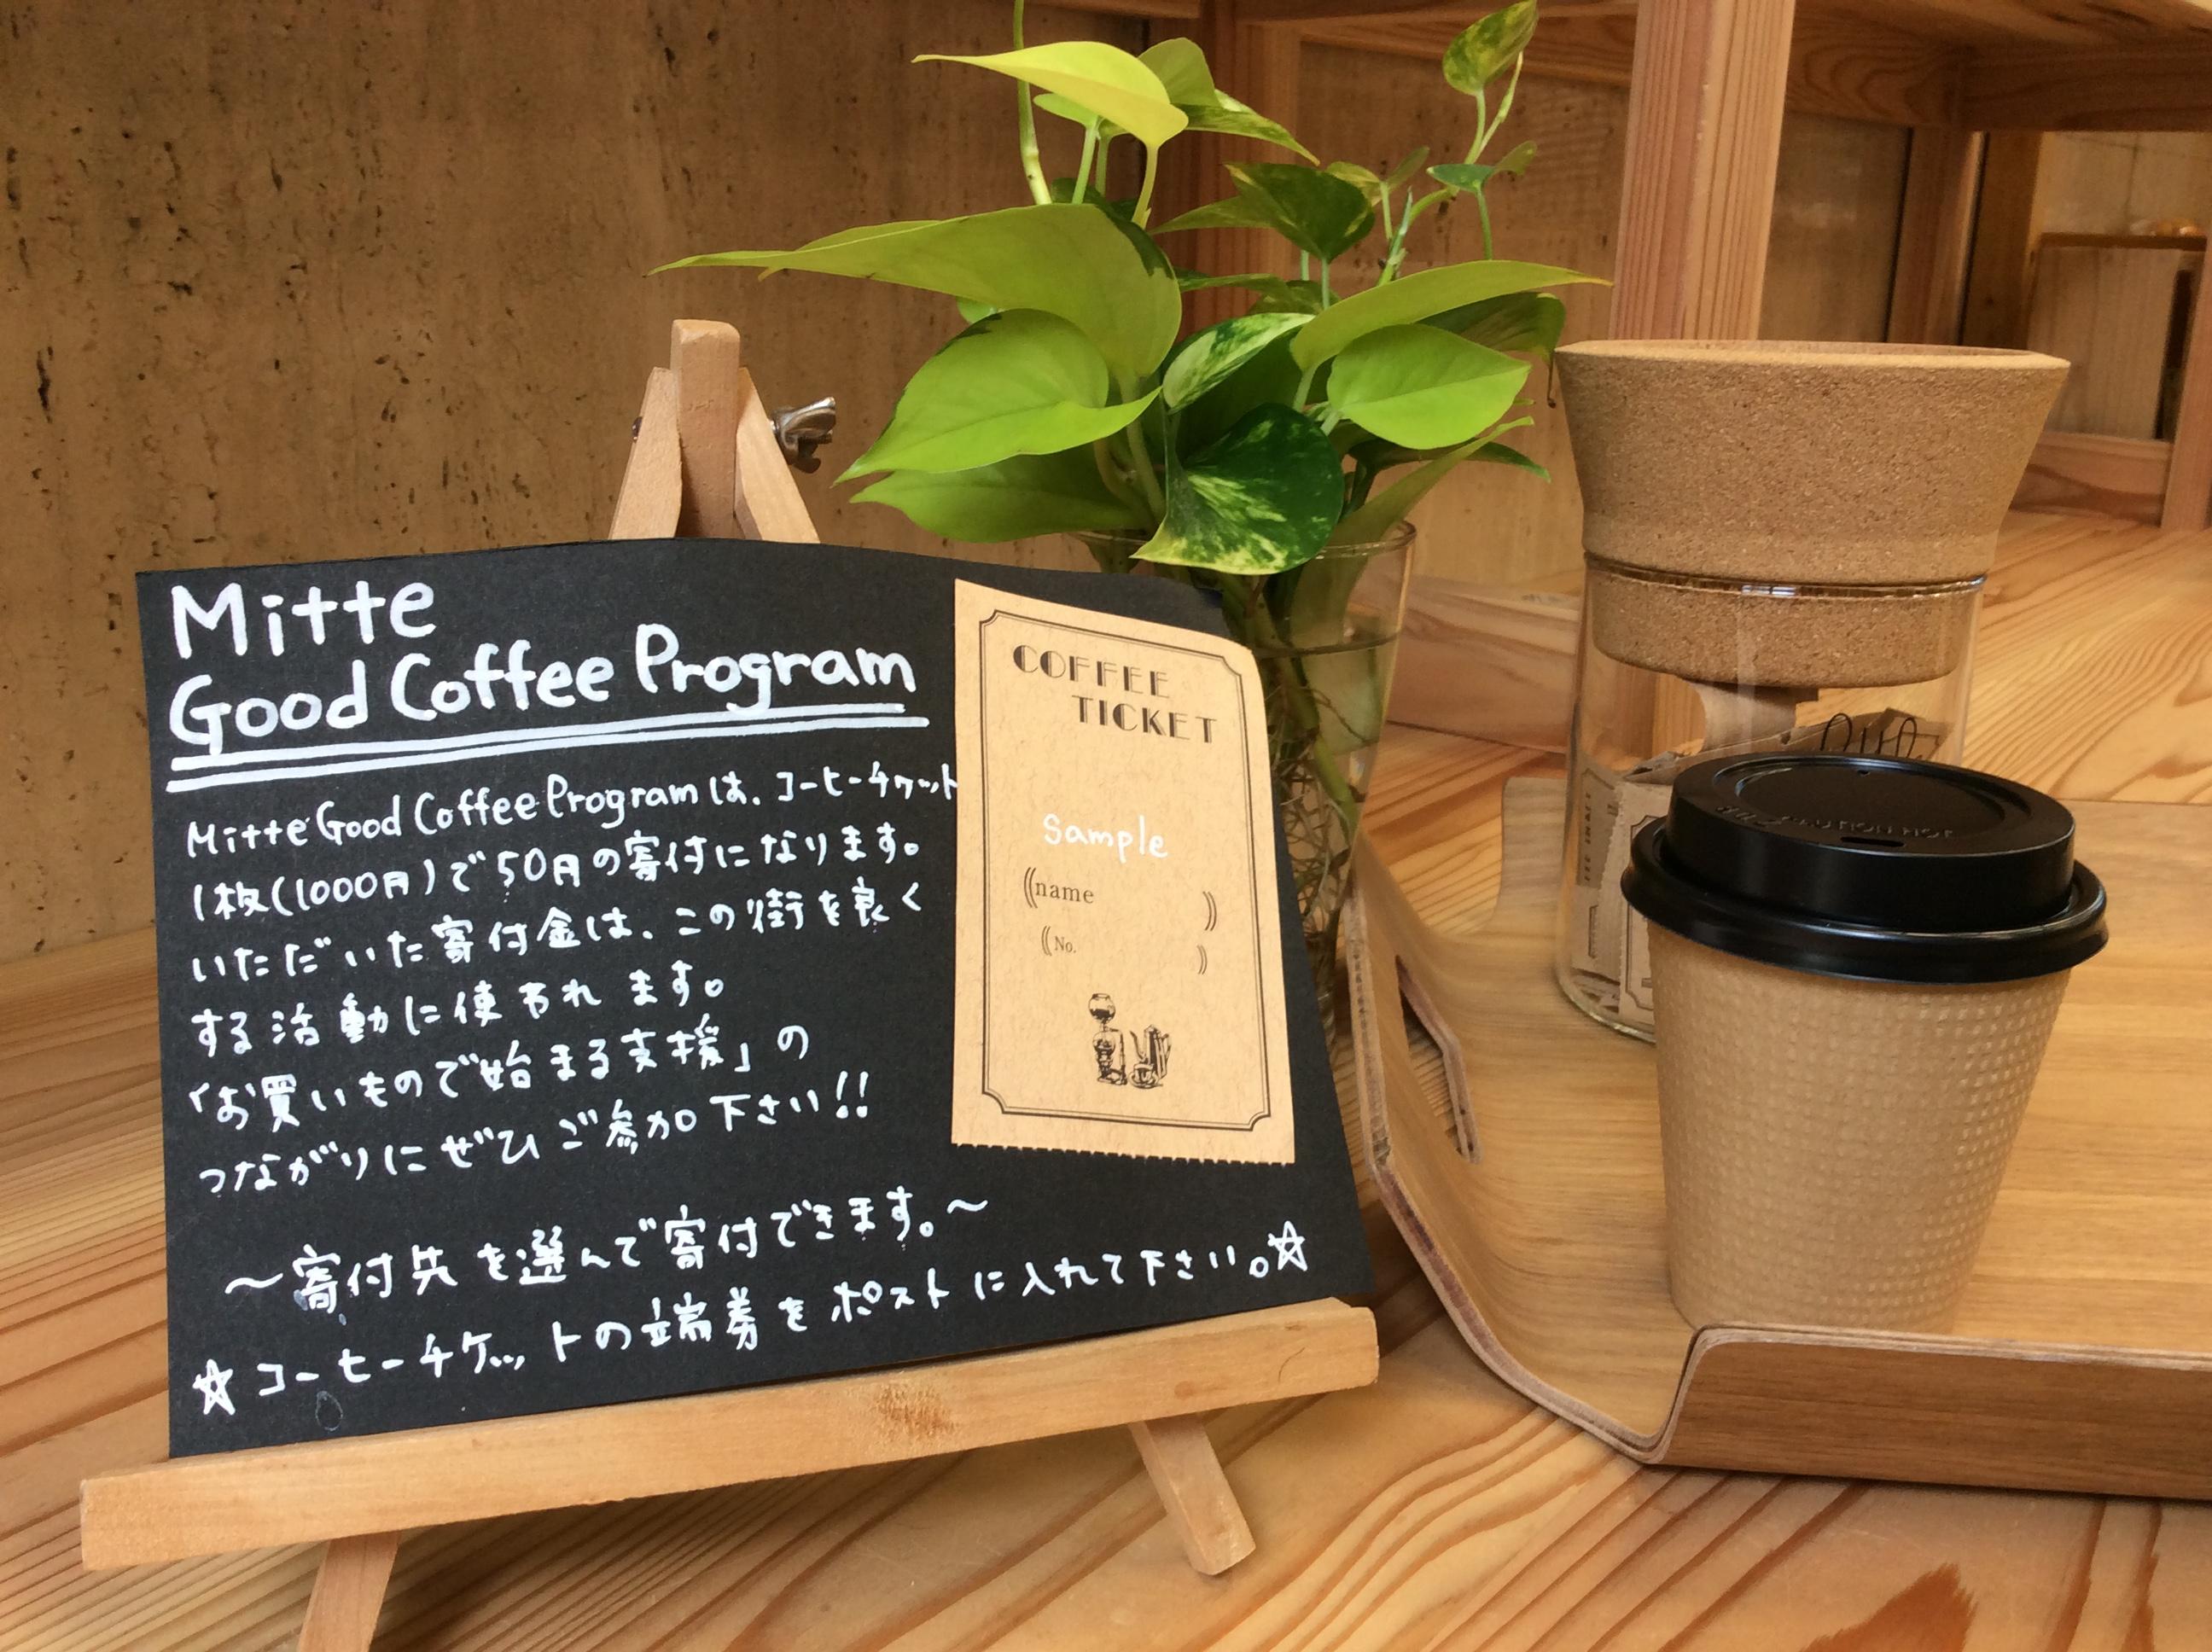 Mitte Good Coffee Program 2月のご報告